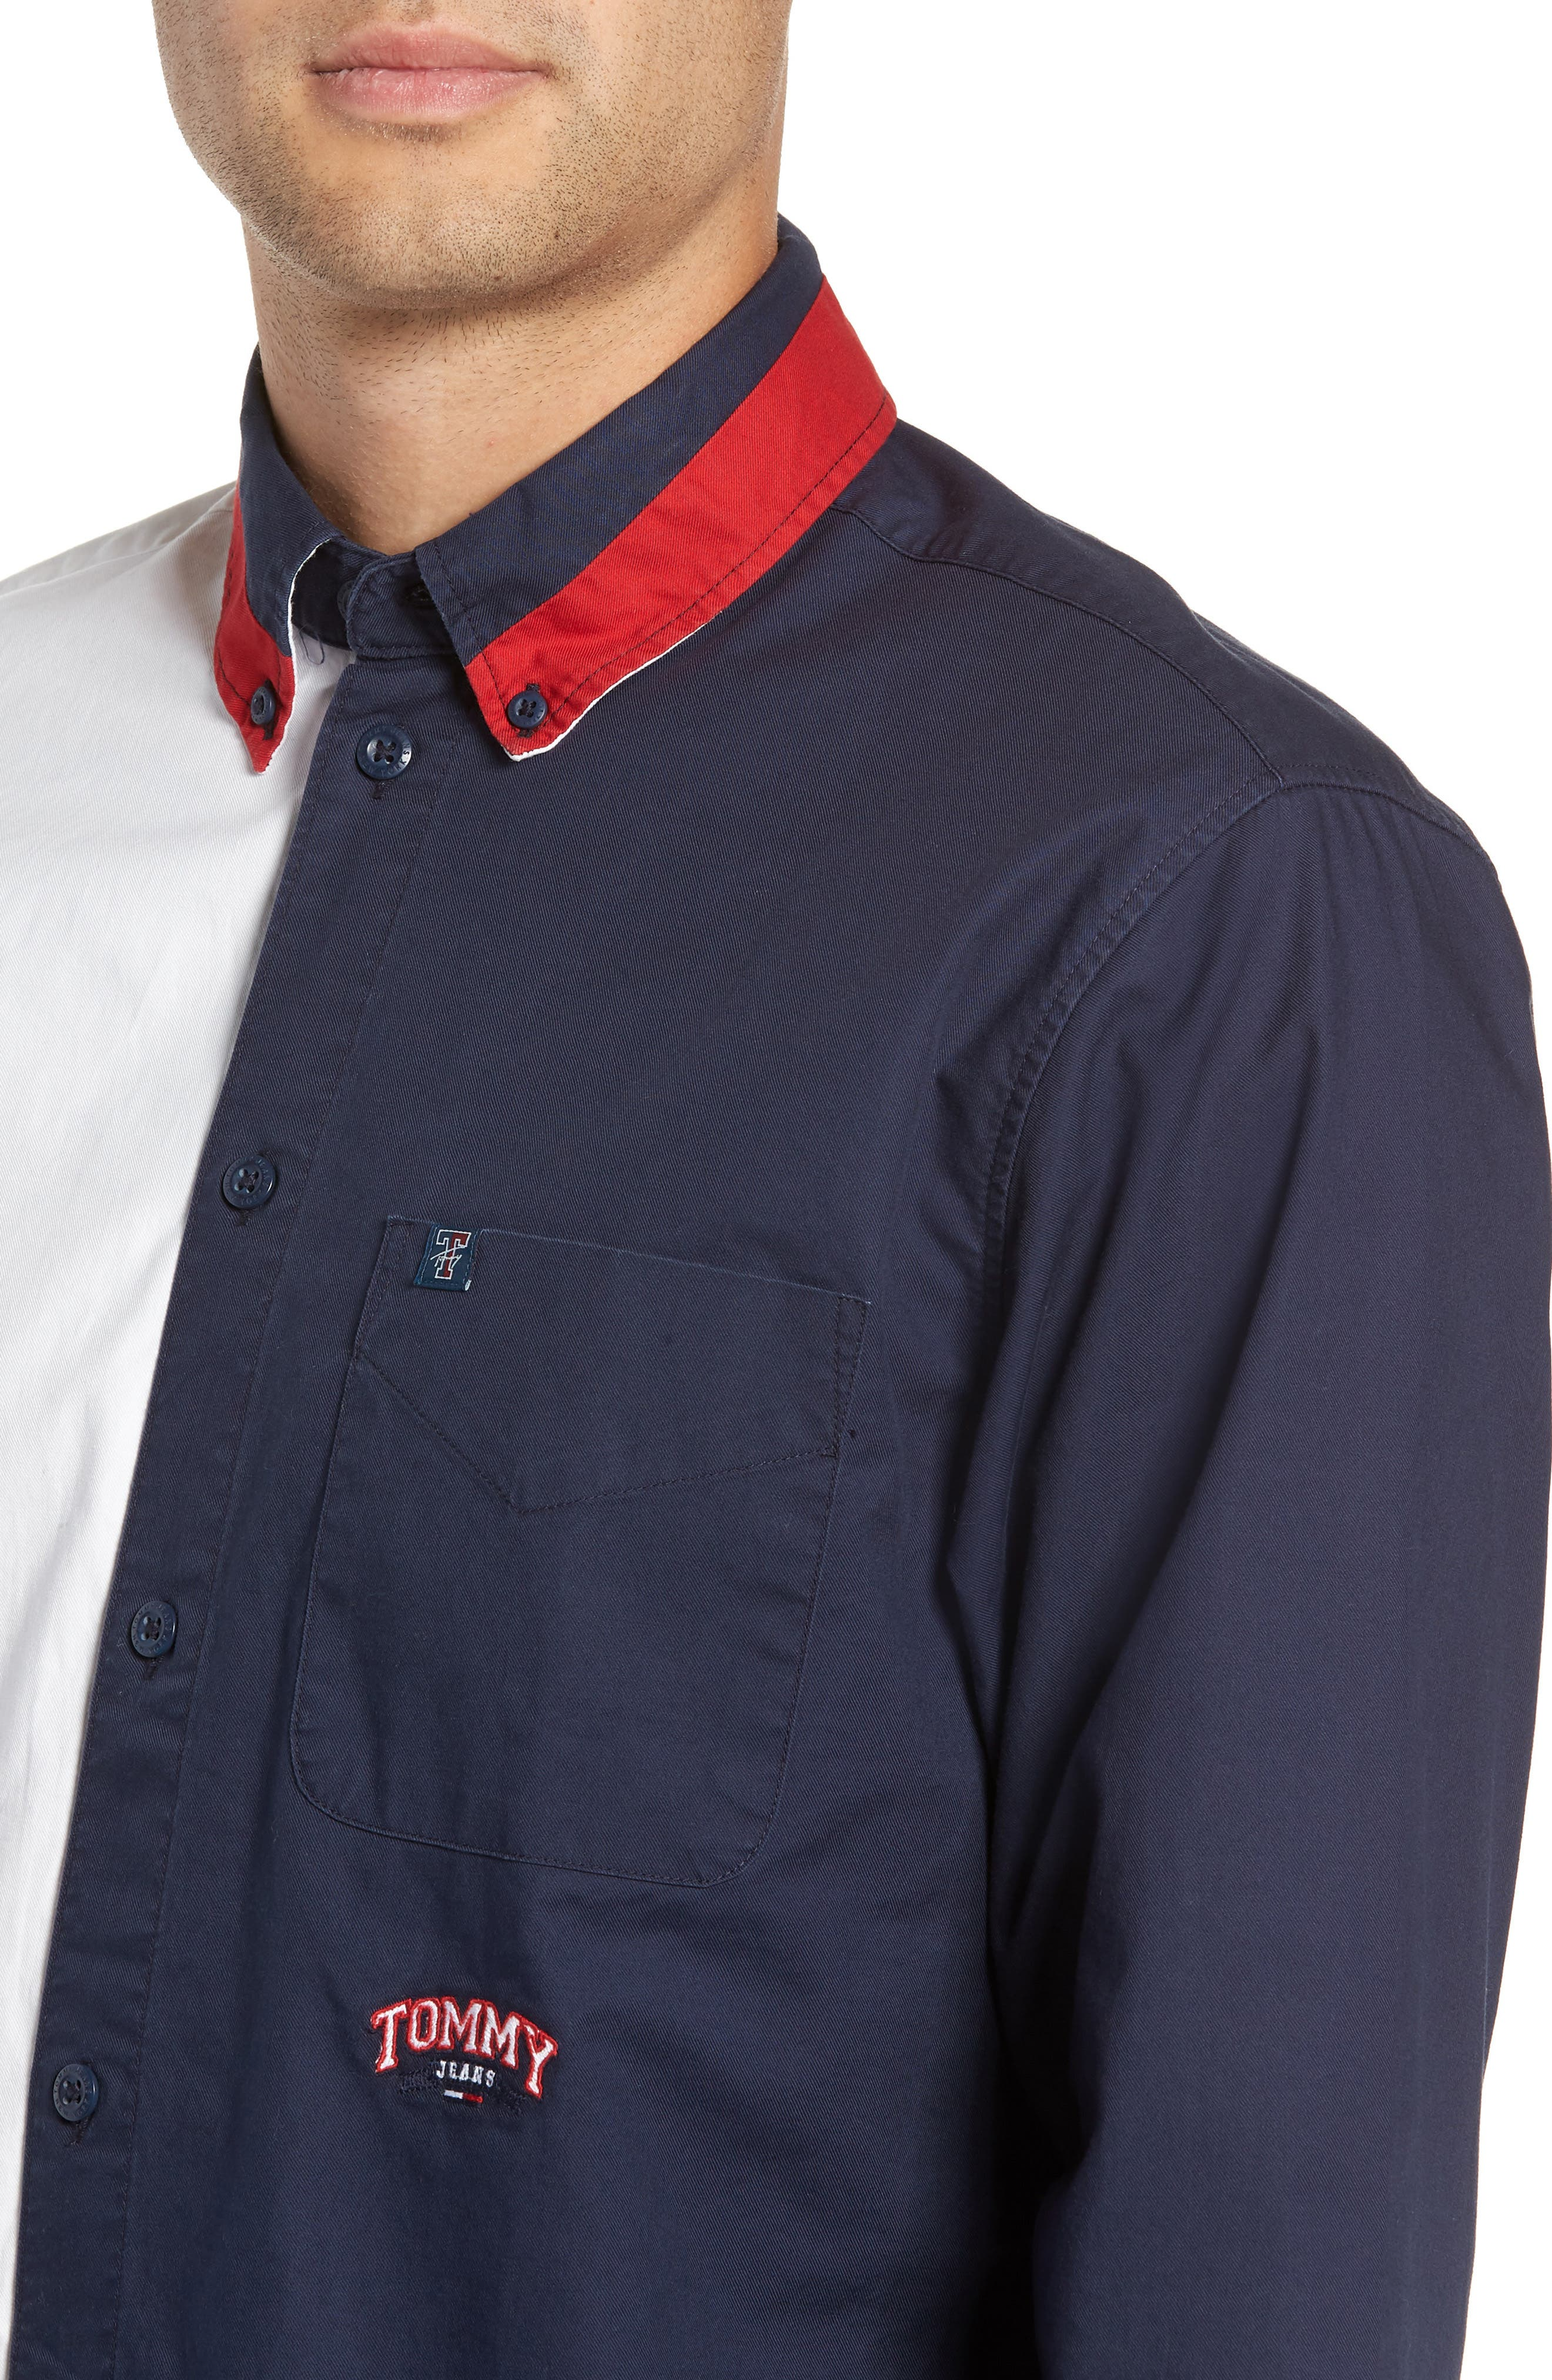 Half & Half Shirt,                             Alternate thumbnail 2, color,                             CLASSIC WHITE / BLACK IRIS